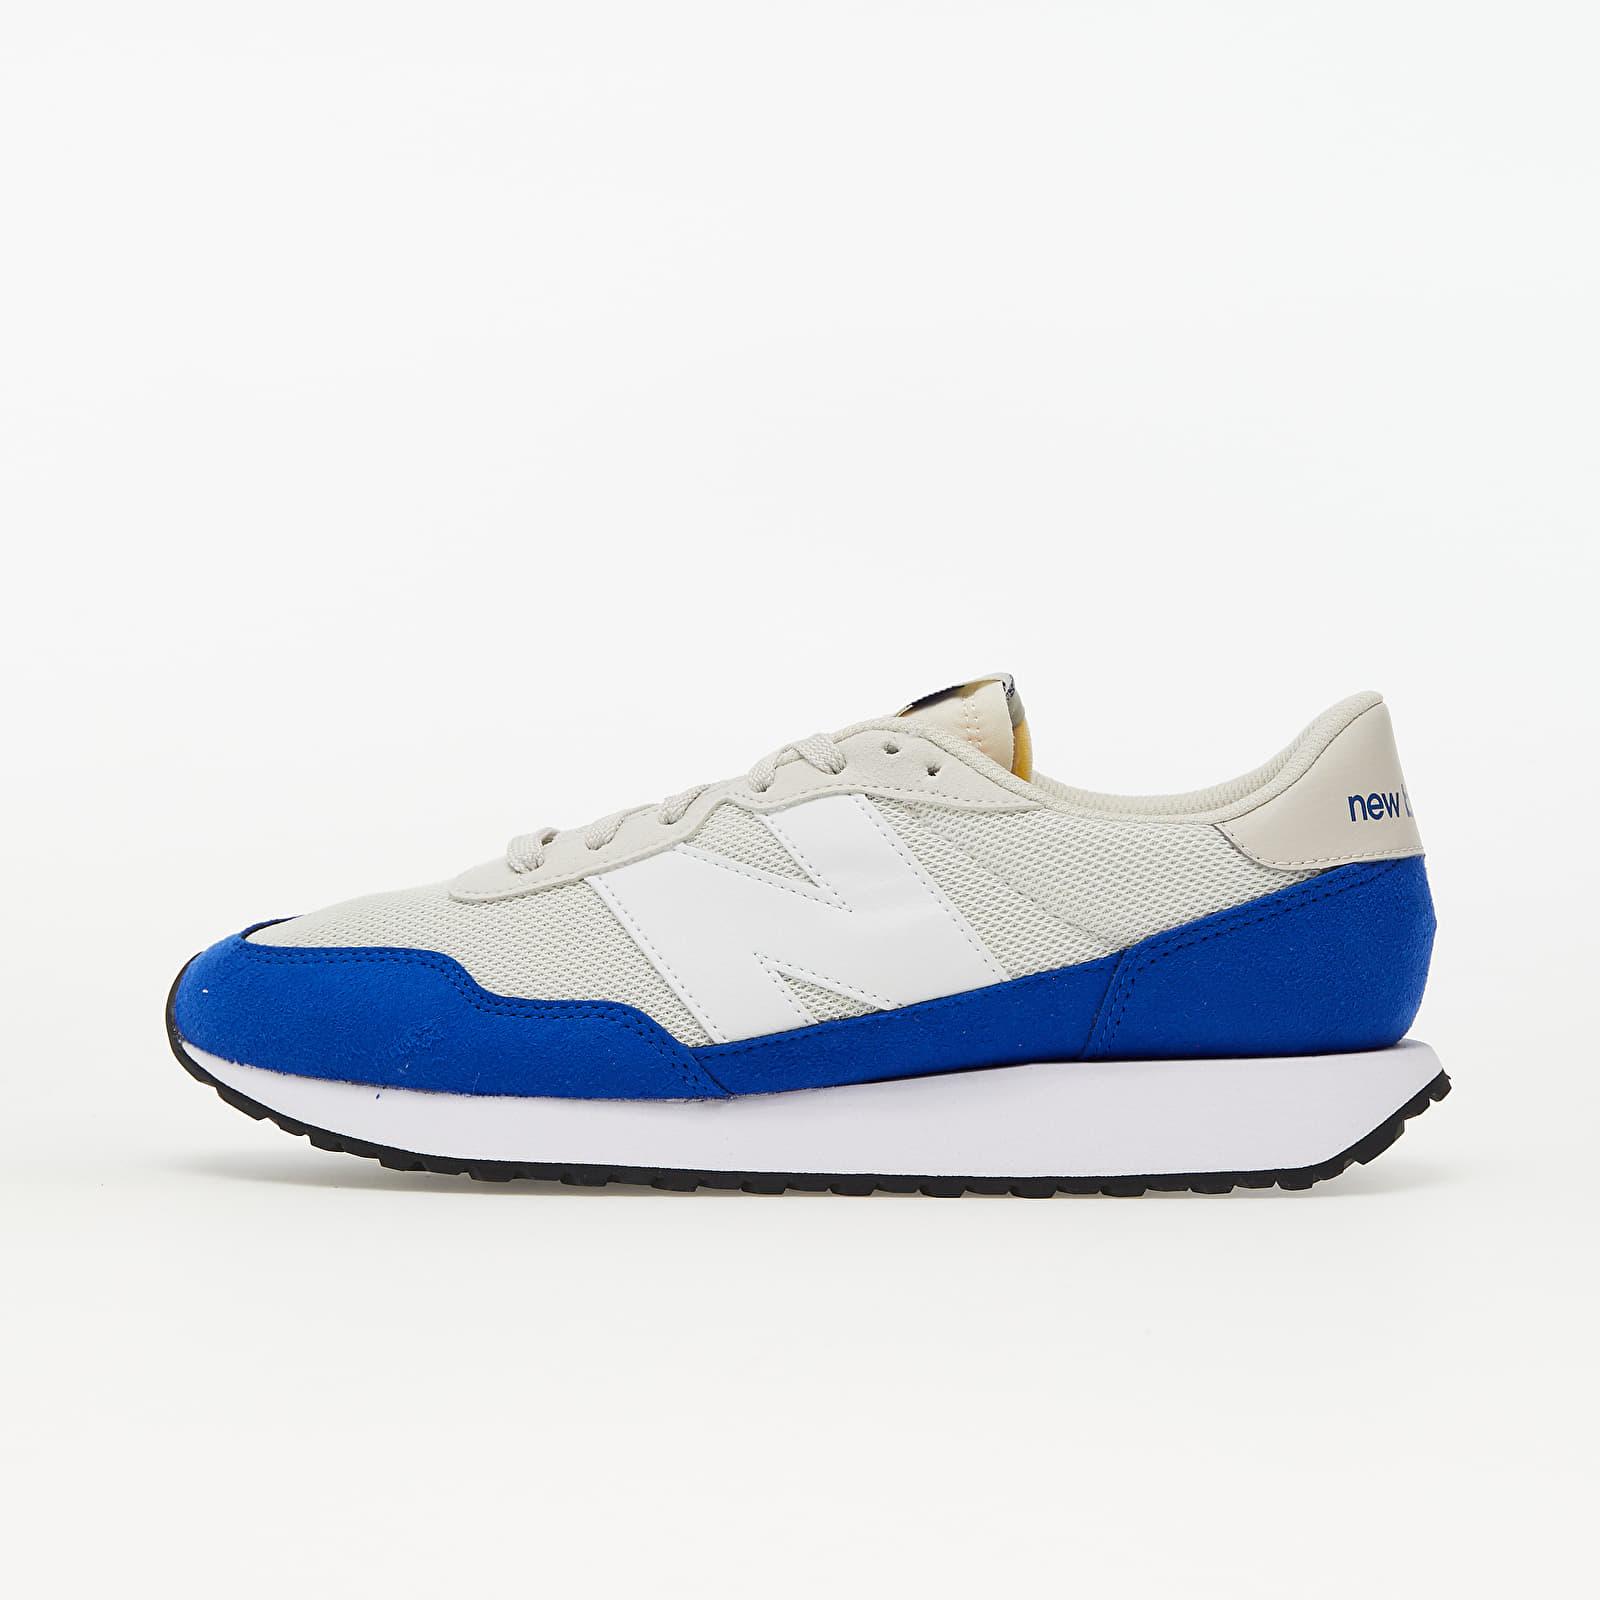 New Balance 237 White/ Royal Blue EUR 40.5